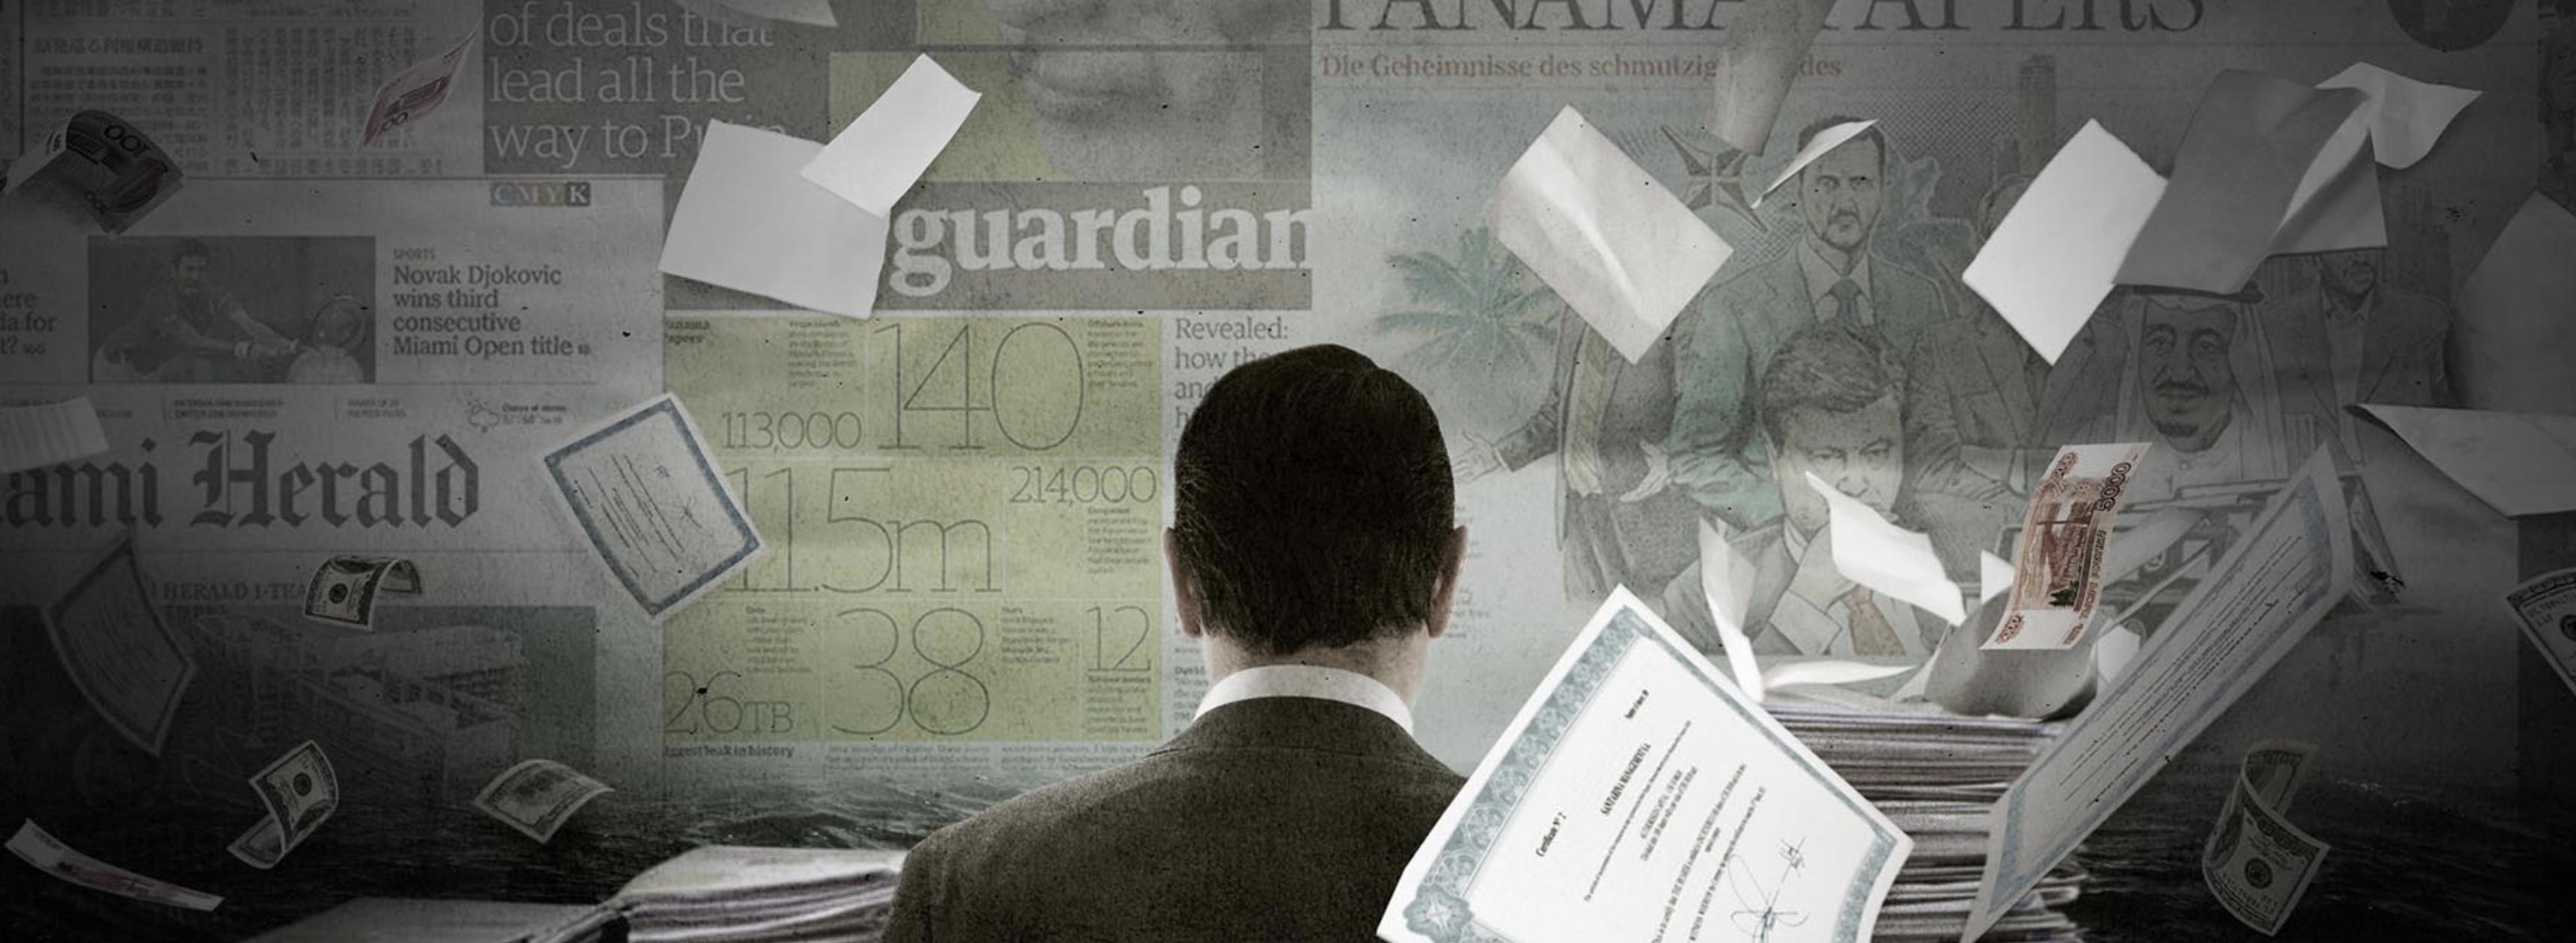 La lucha contra el crimen offshore será una larga batalla